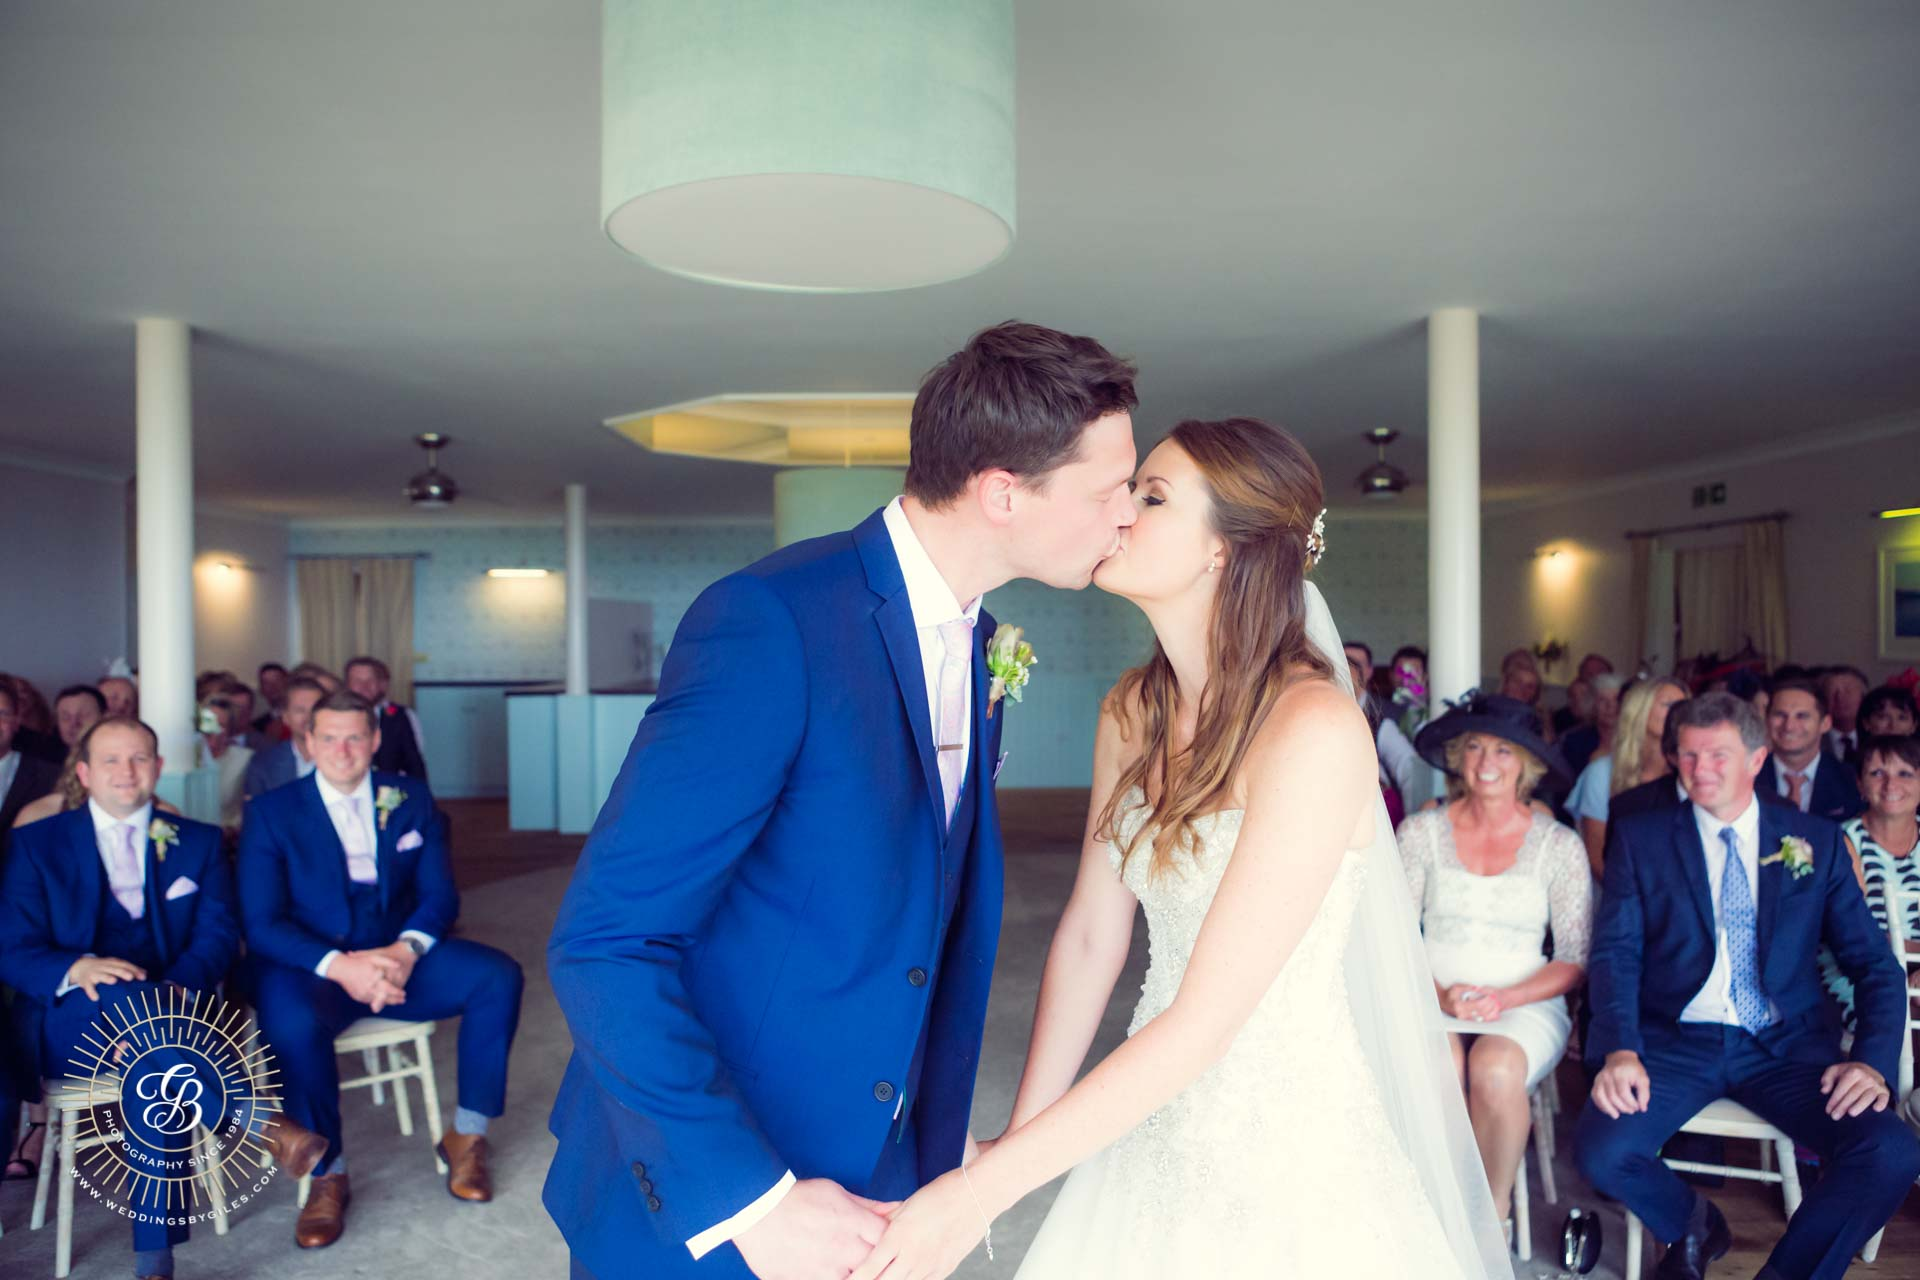 The wedding kiss in Slacombe